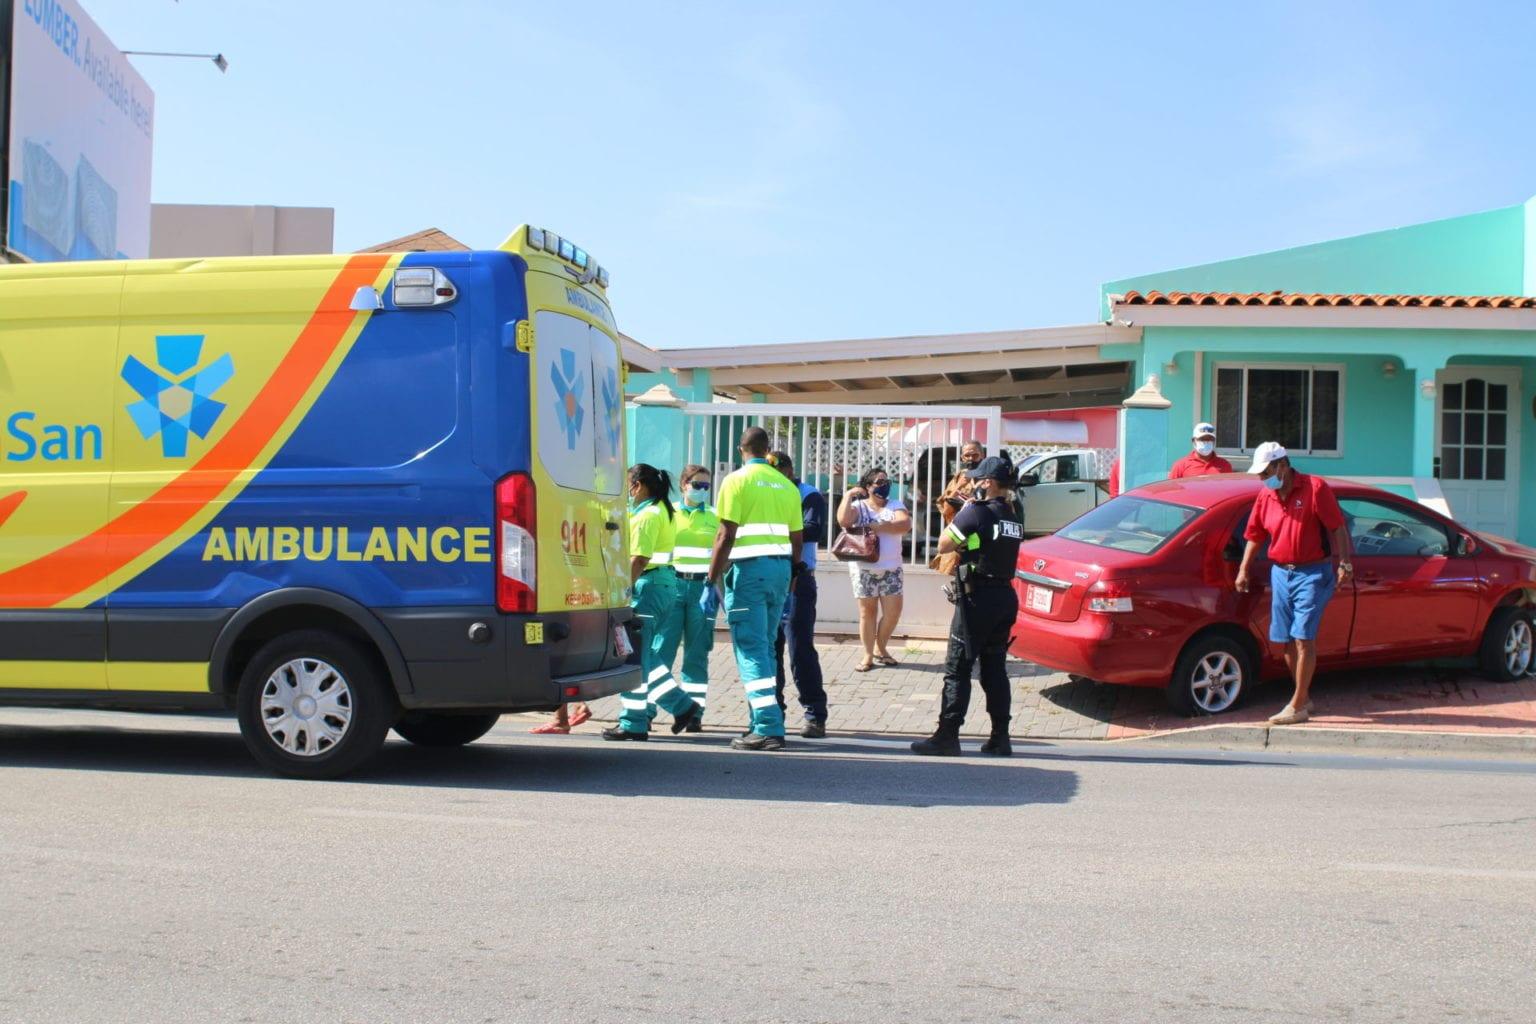 Chauffeur a perde control di auto y pega den muraya